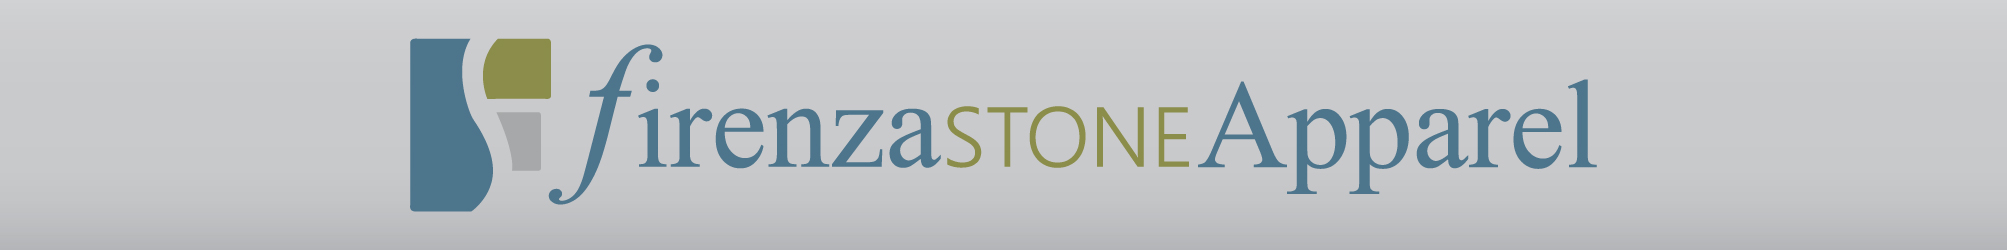 Firenza Stone Apparel